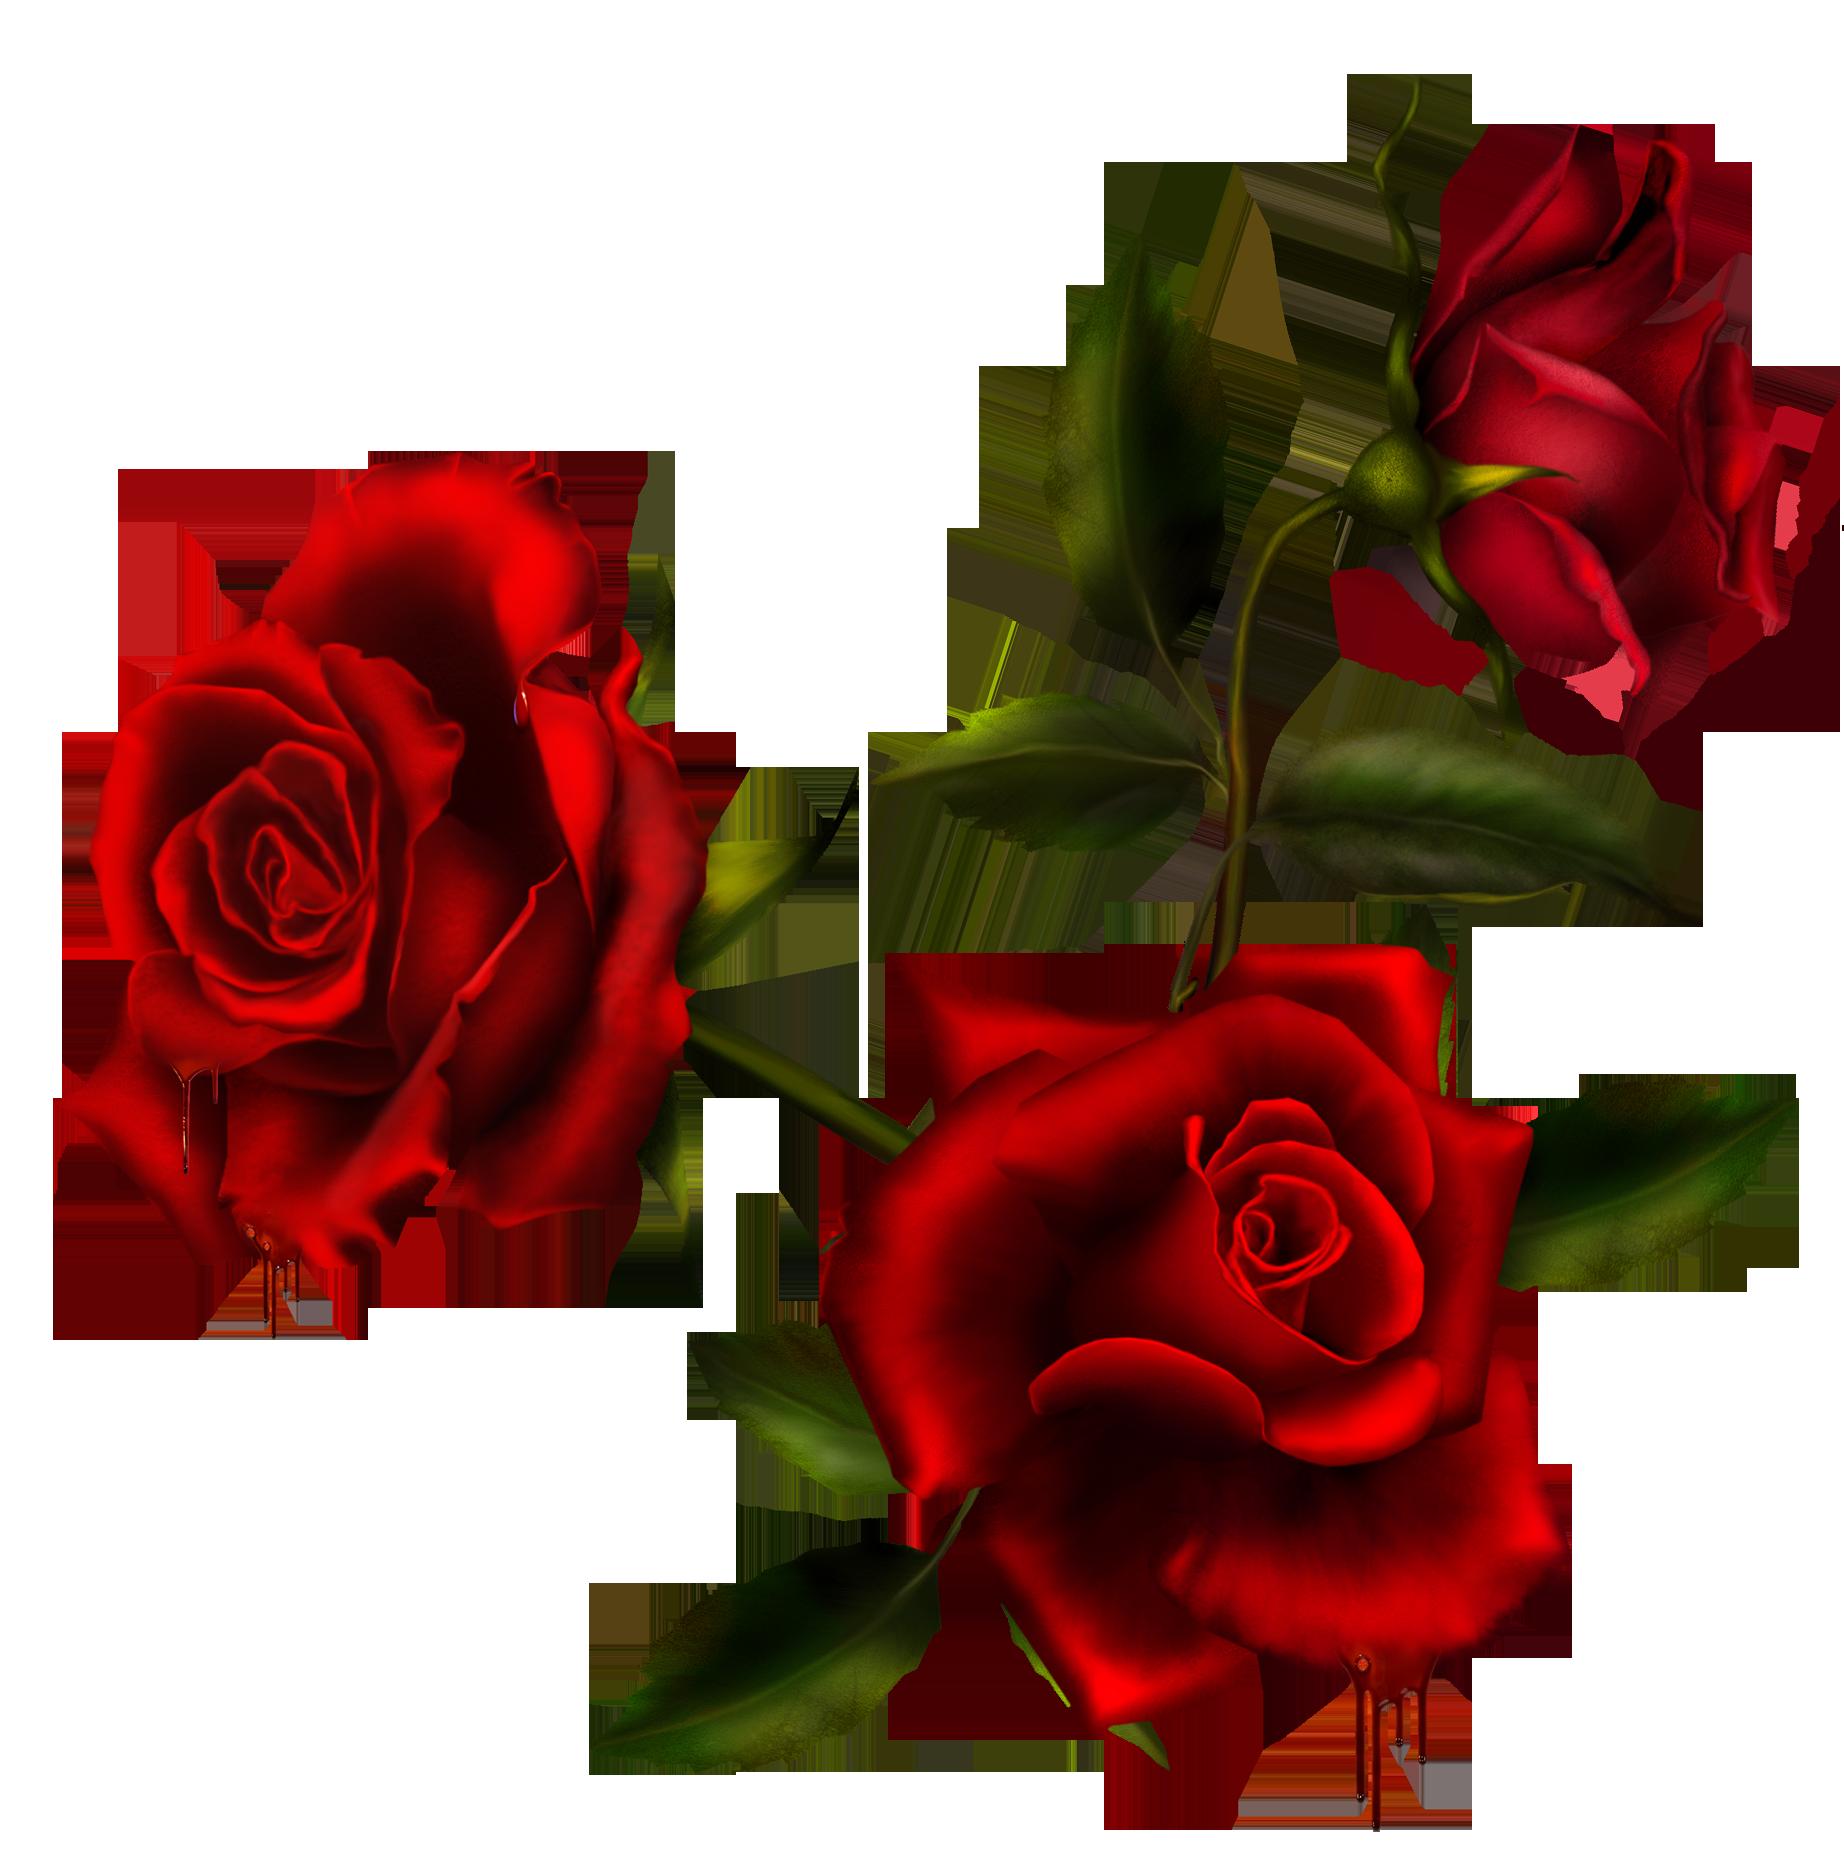 Rose Bouquet 3 by Autumns-Muse on DeviantArt